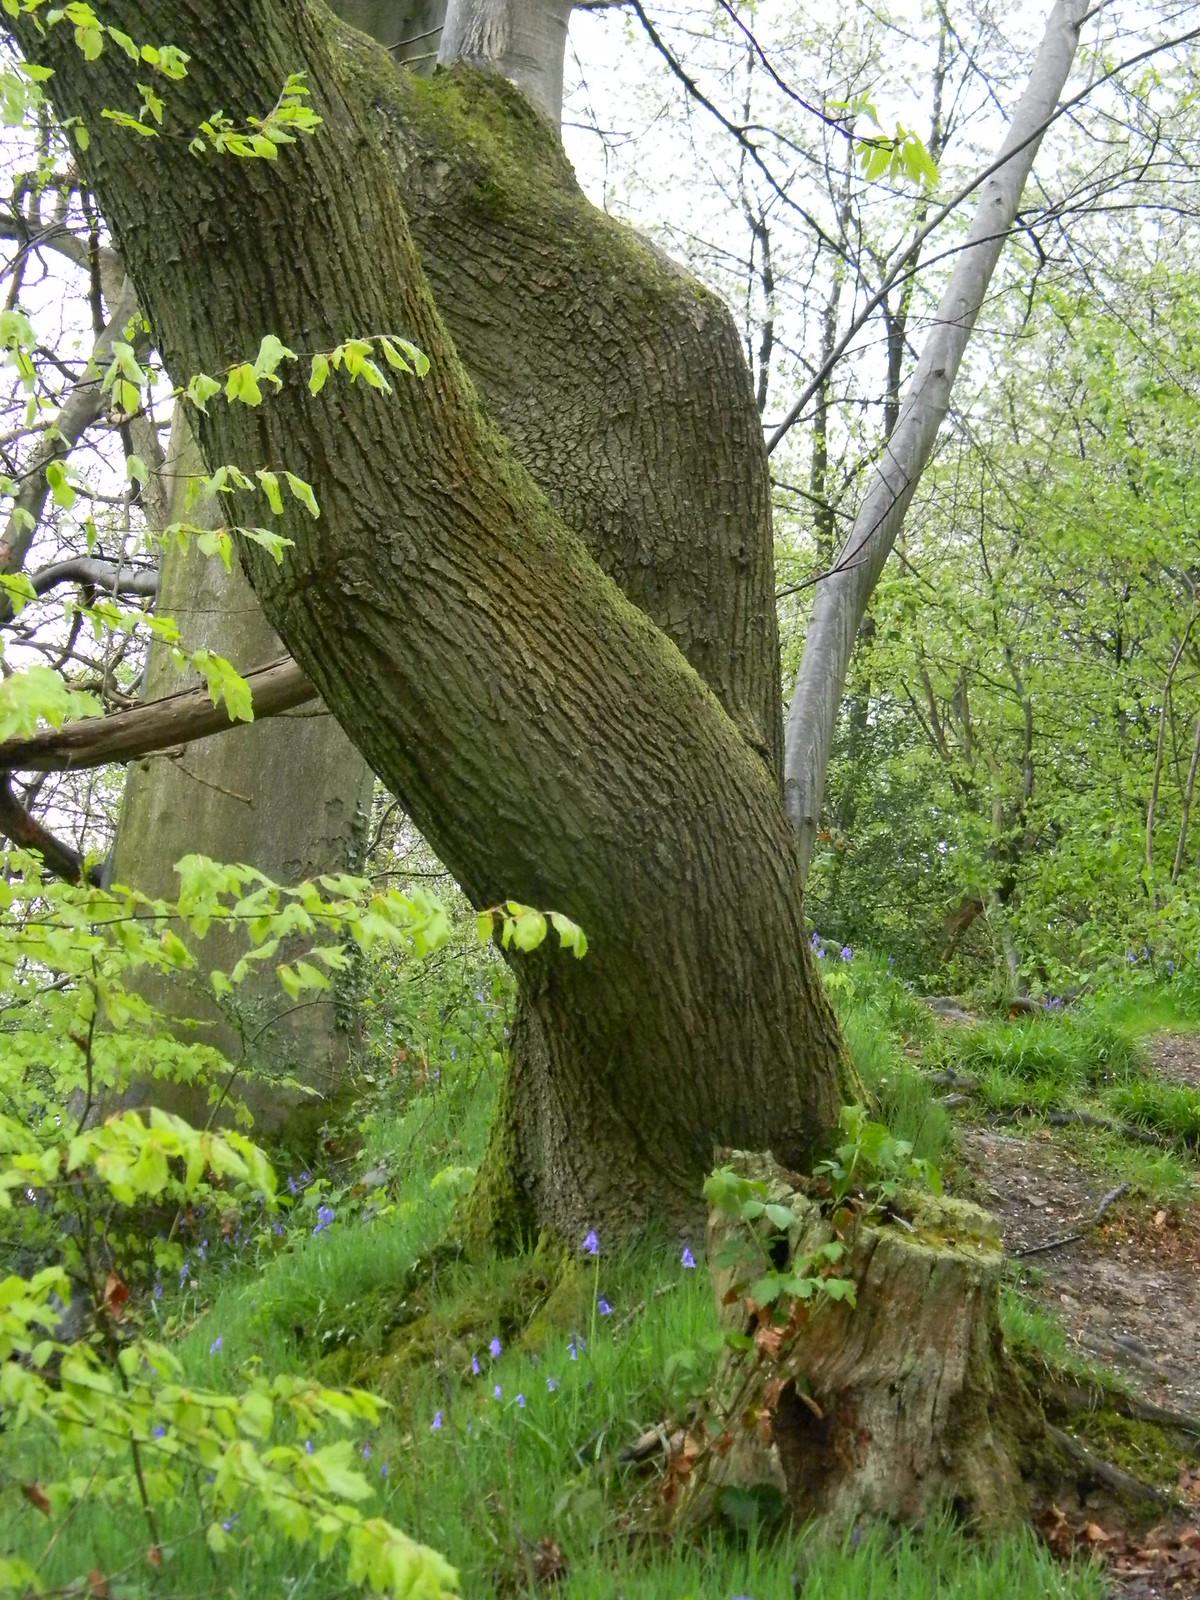 Twisted trees Borough Green to Sevenoaks (composite walk)